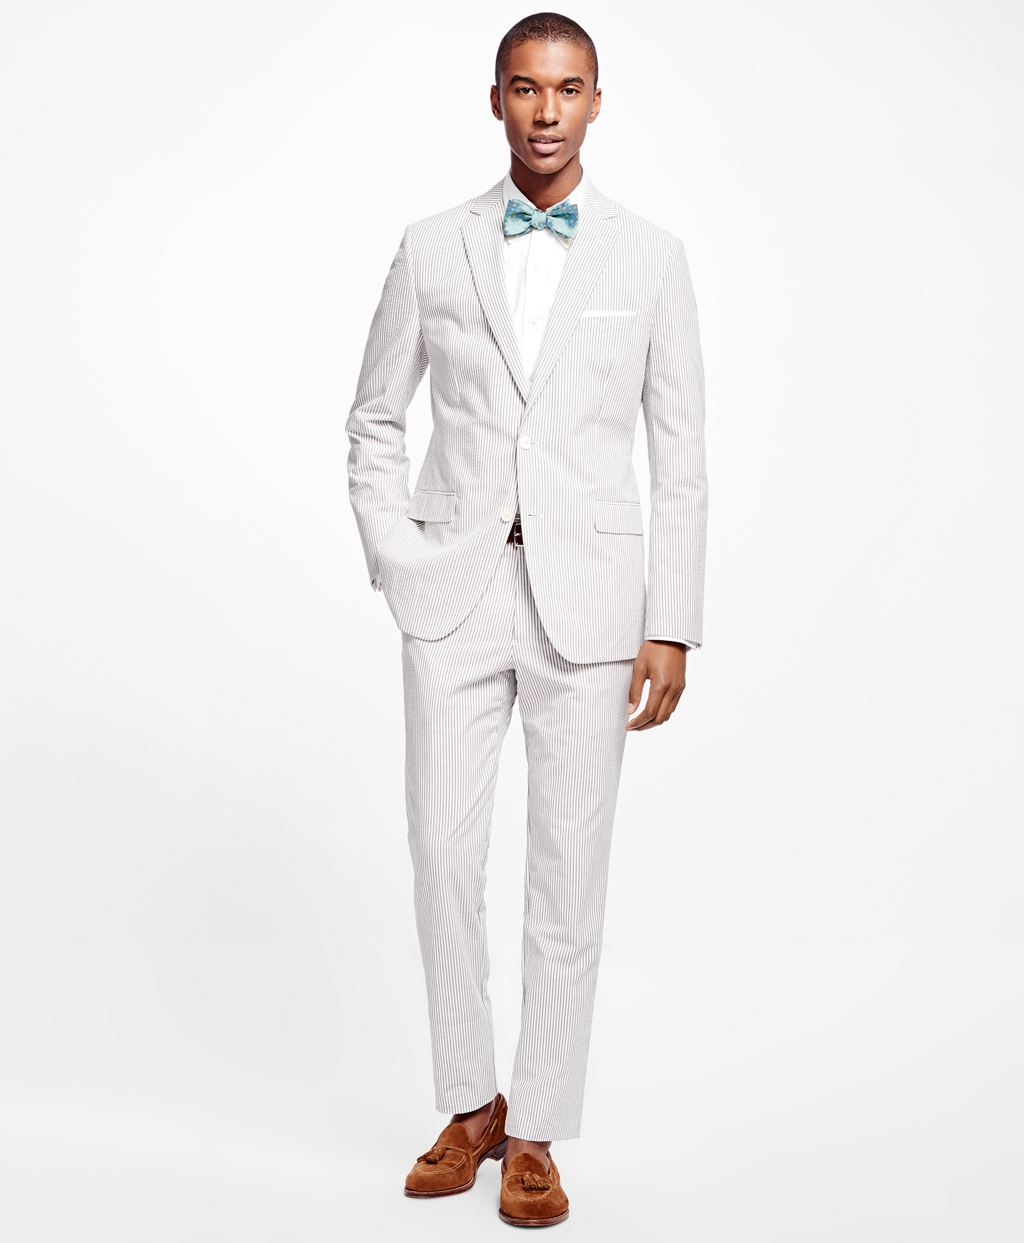 Shoes To Wear With Seersucker Suit